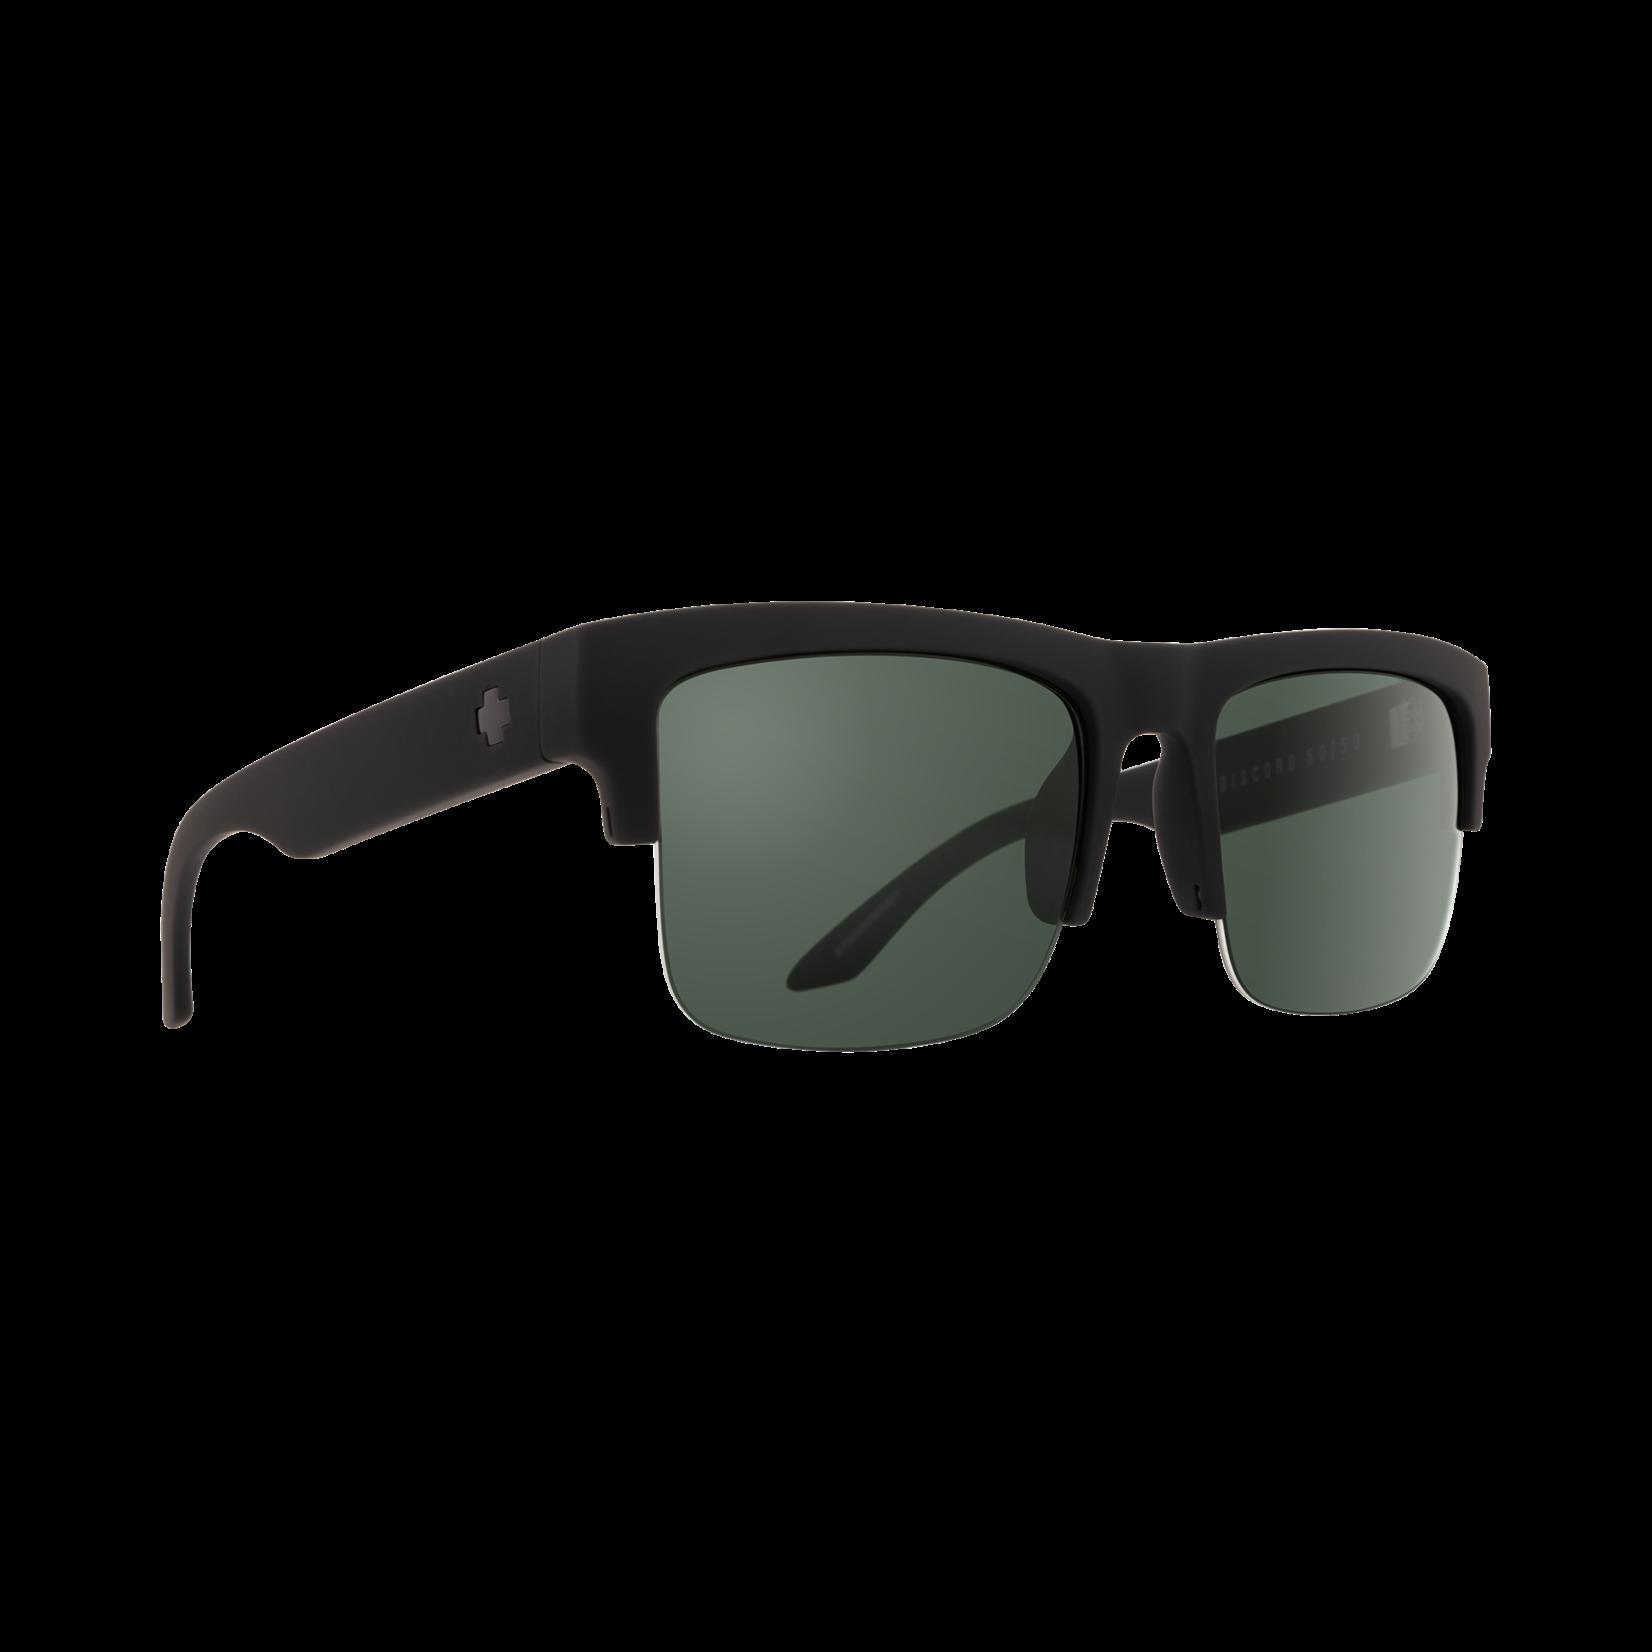 Spy DISCORD 5050 SOFT MATTE BLACK HAPPY GRAY GREEN POLAR